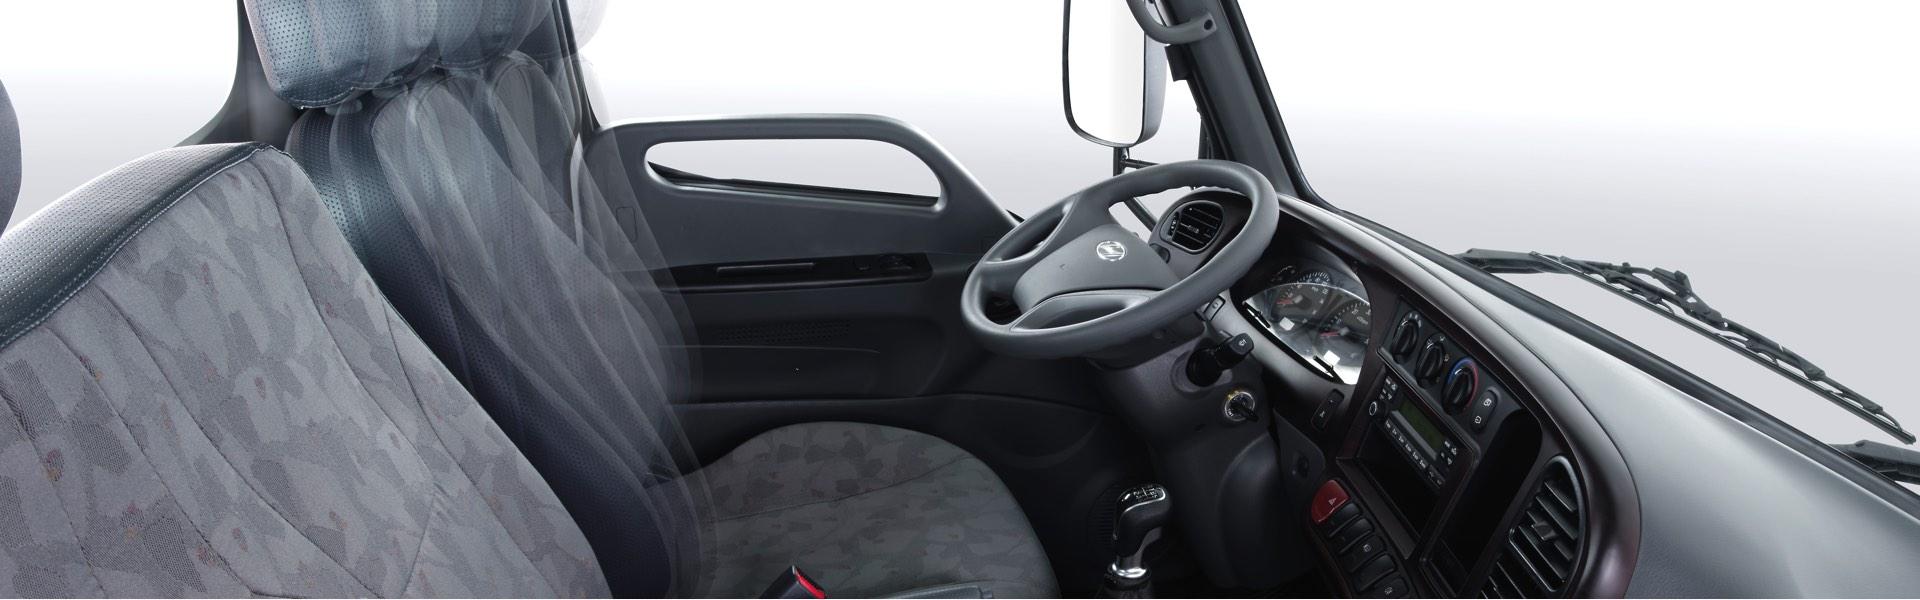 hd35city - interior 3